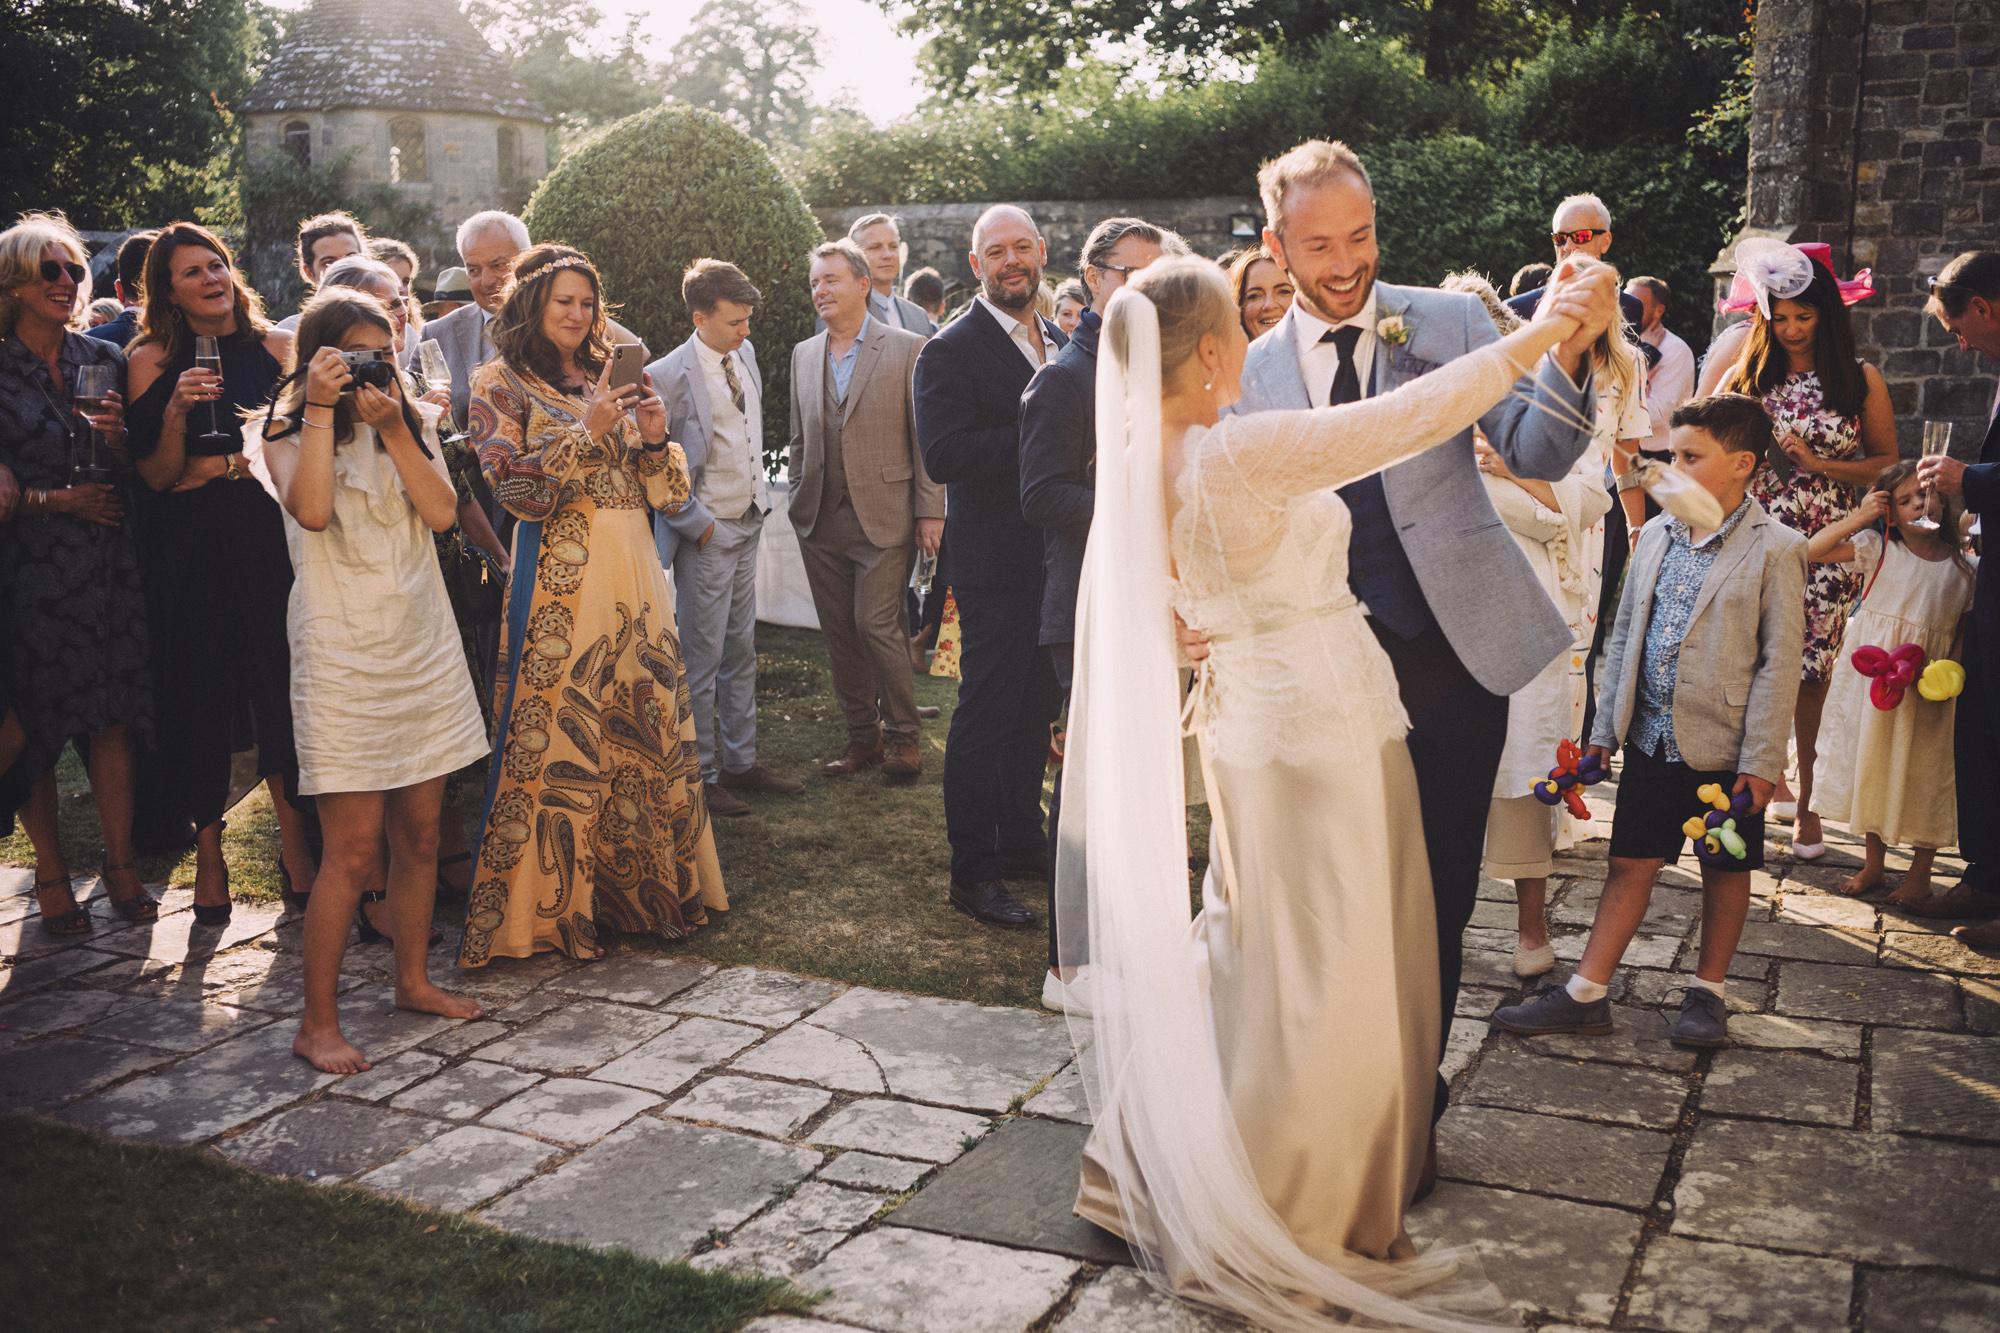 Jaz-Kate-Beaumont-Oyster-Silk-Bias-Cut-Wedding-Gown-Larkspur-Lace-Top-Sussex-Wedding-15.jpg